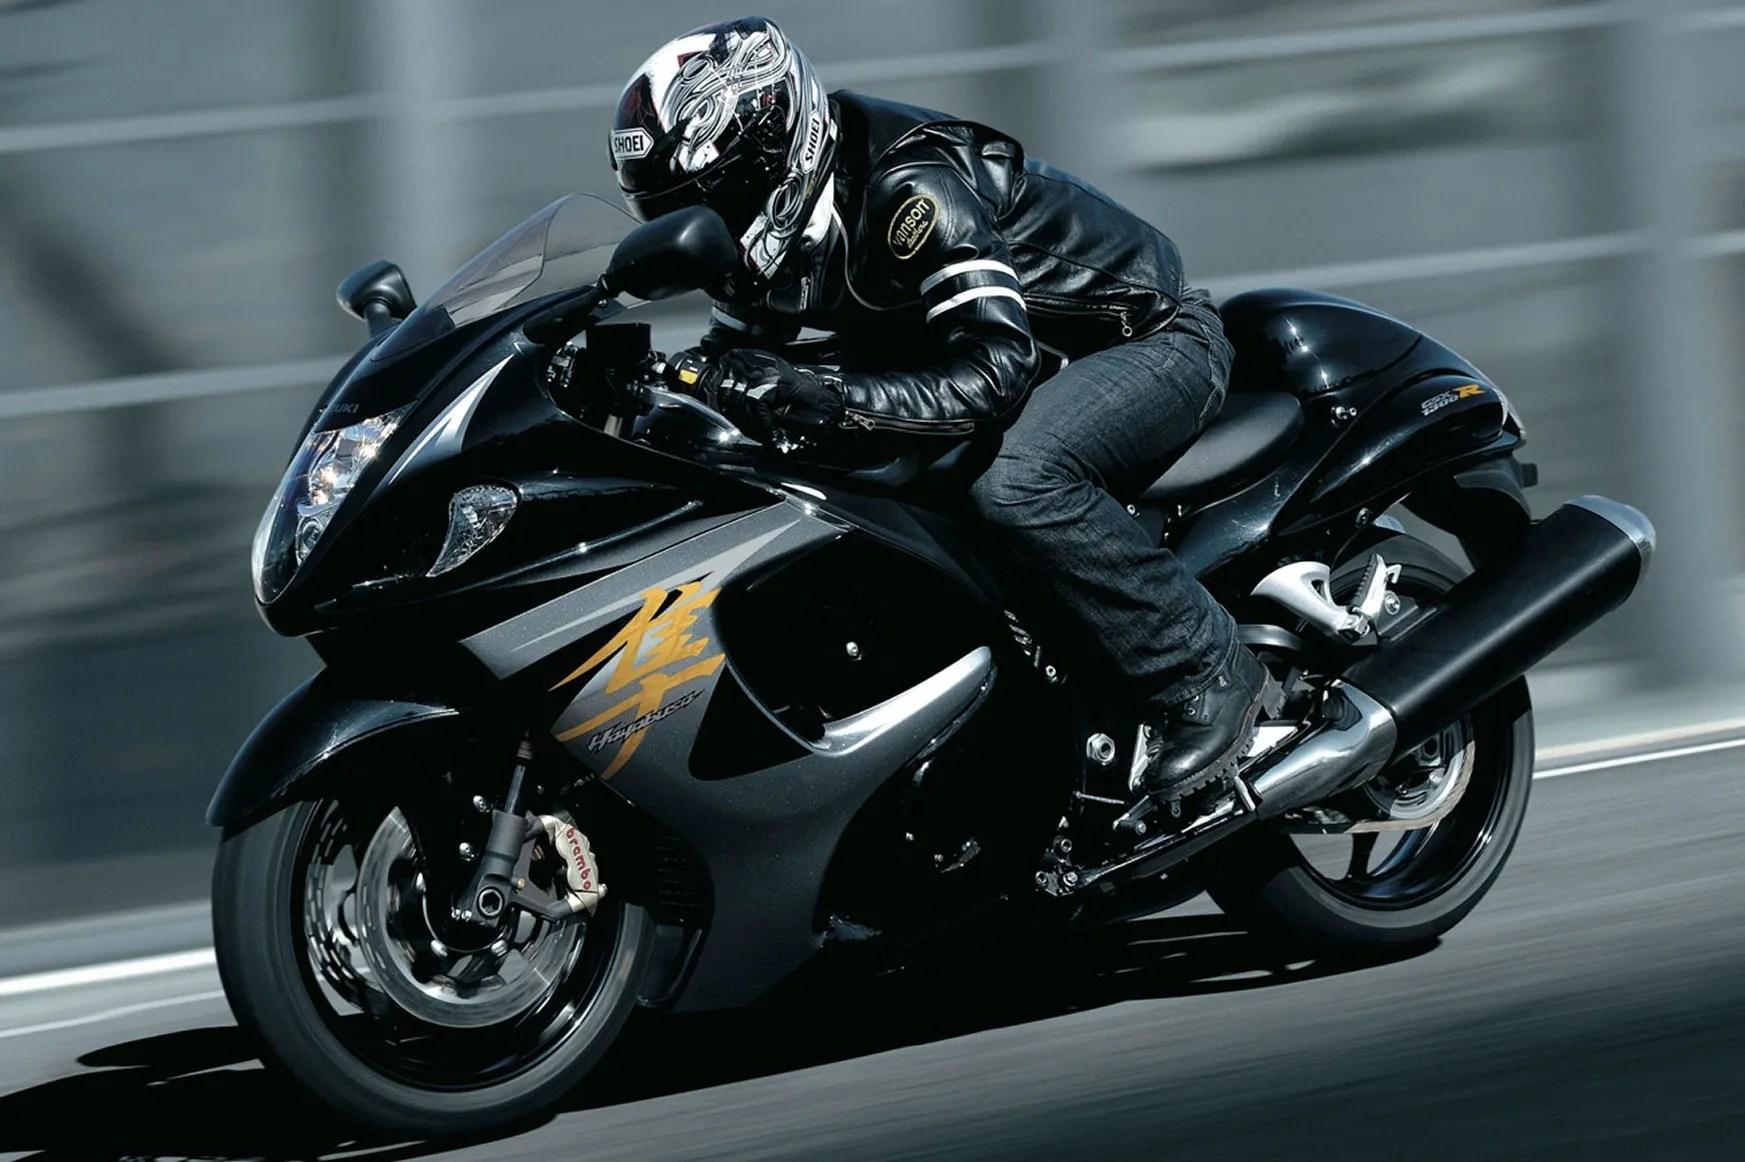 Suzuki Motorcycles In Future Might Have Semi automatic